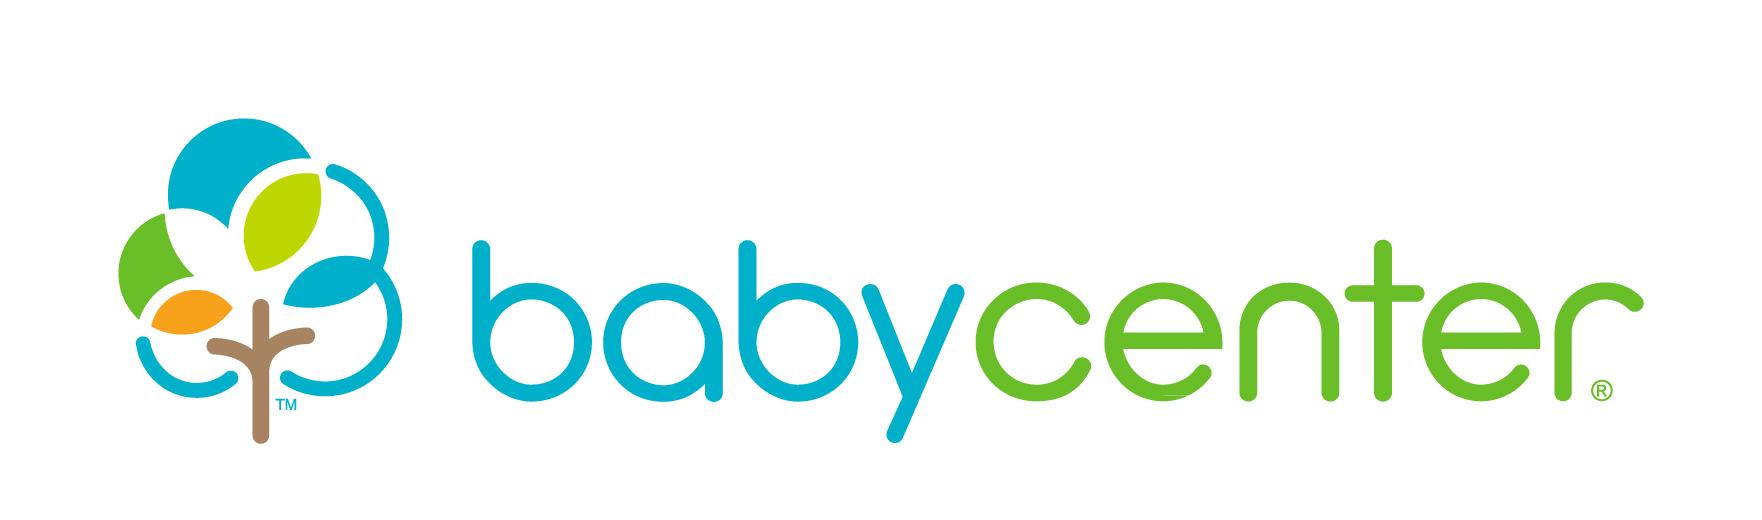 babycenter logo.jpg